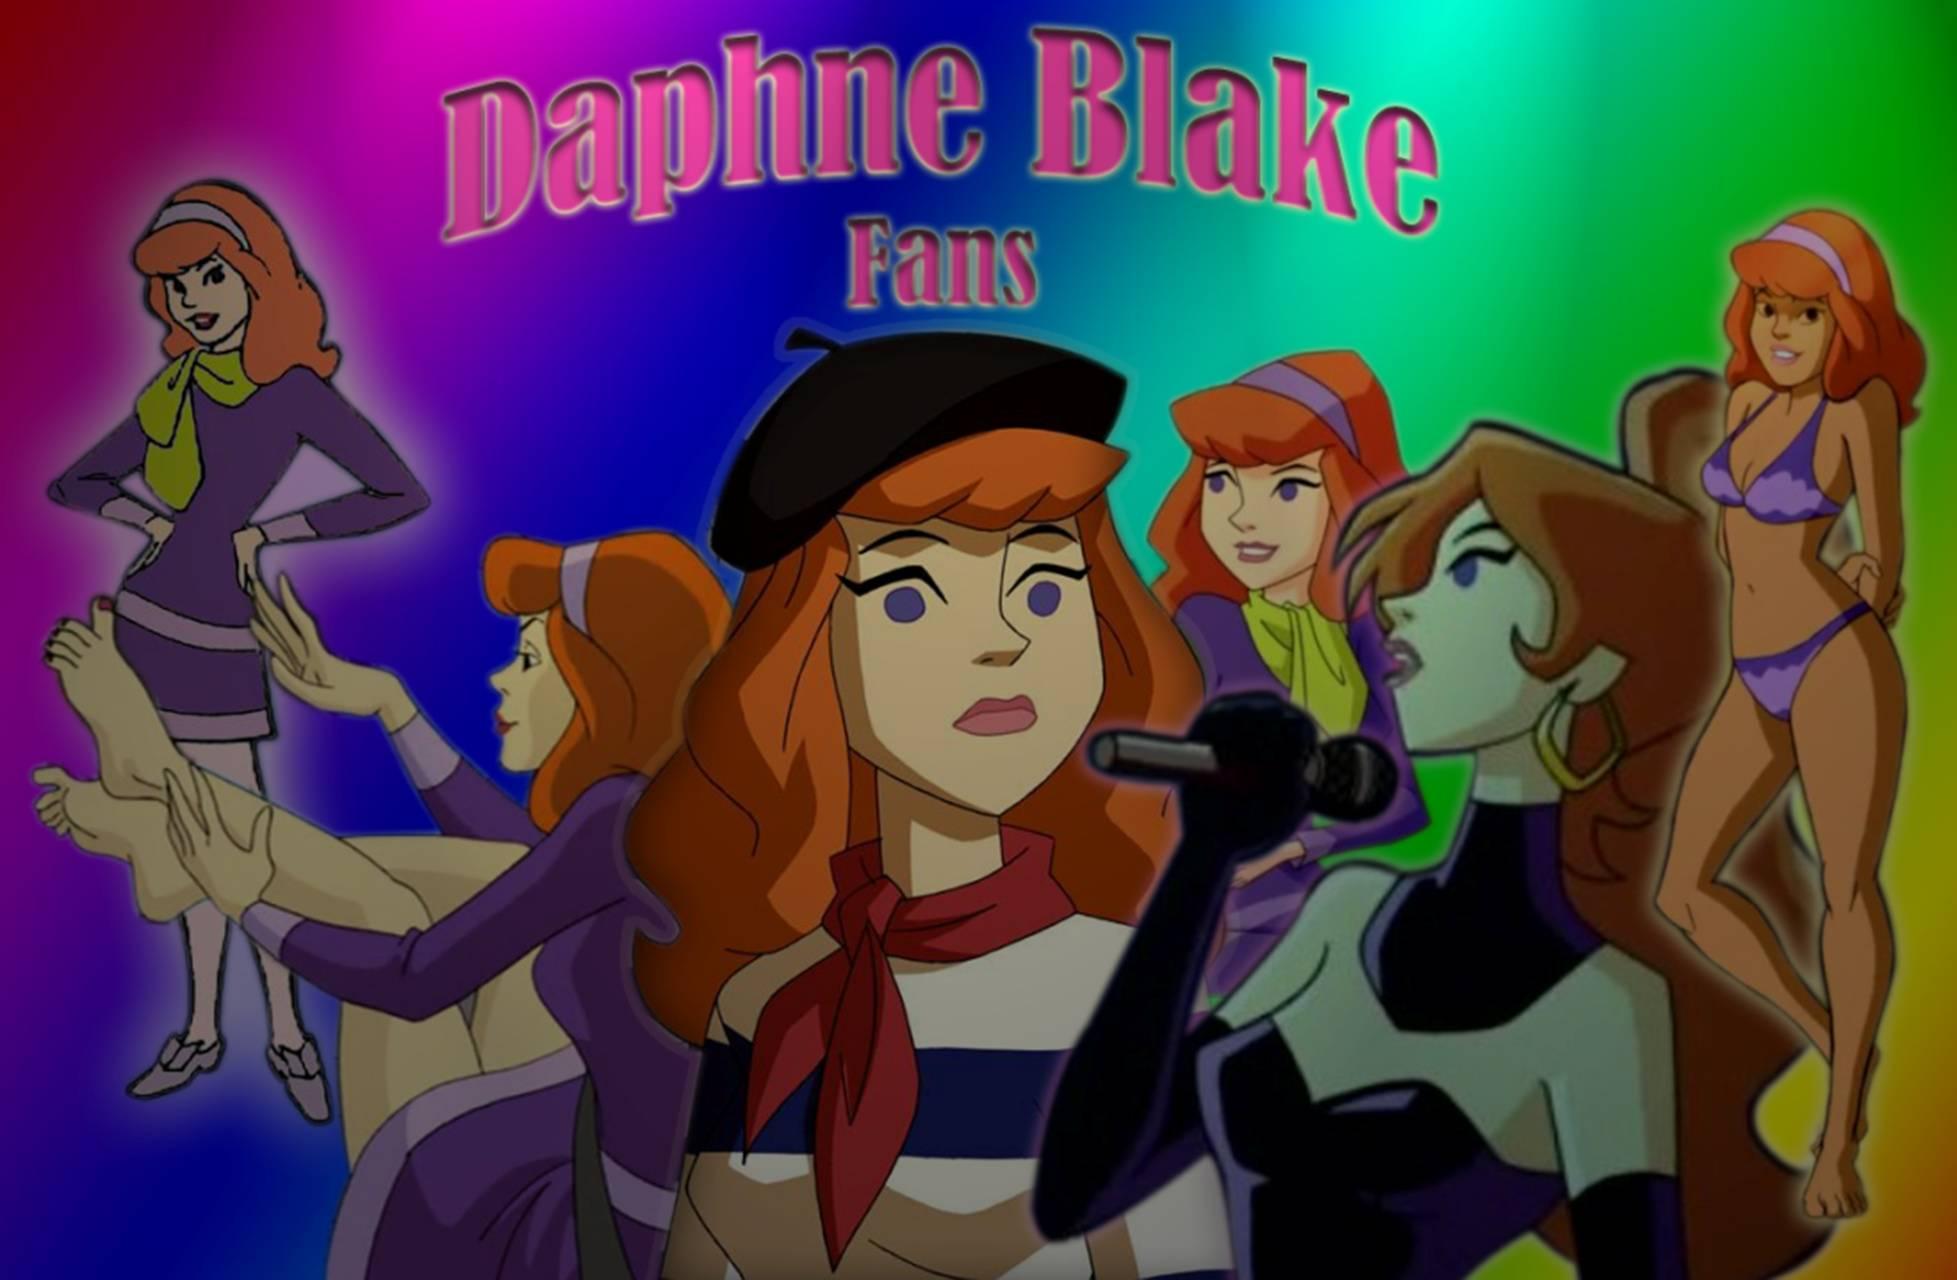 Daphe Blake